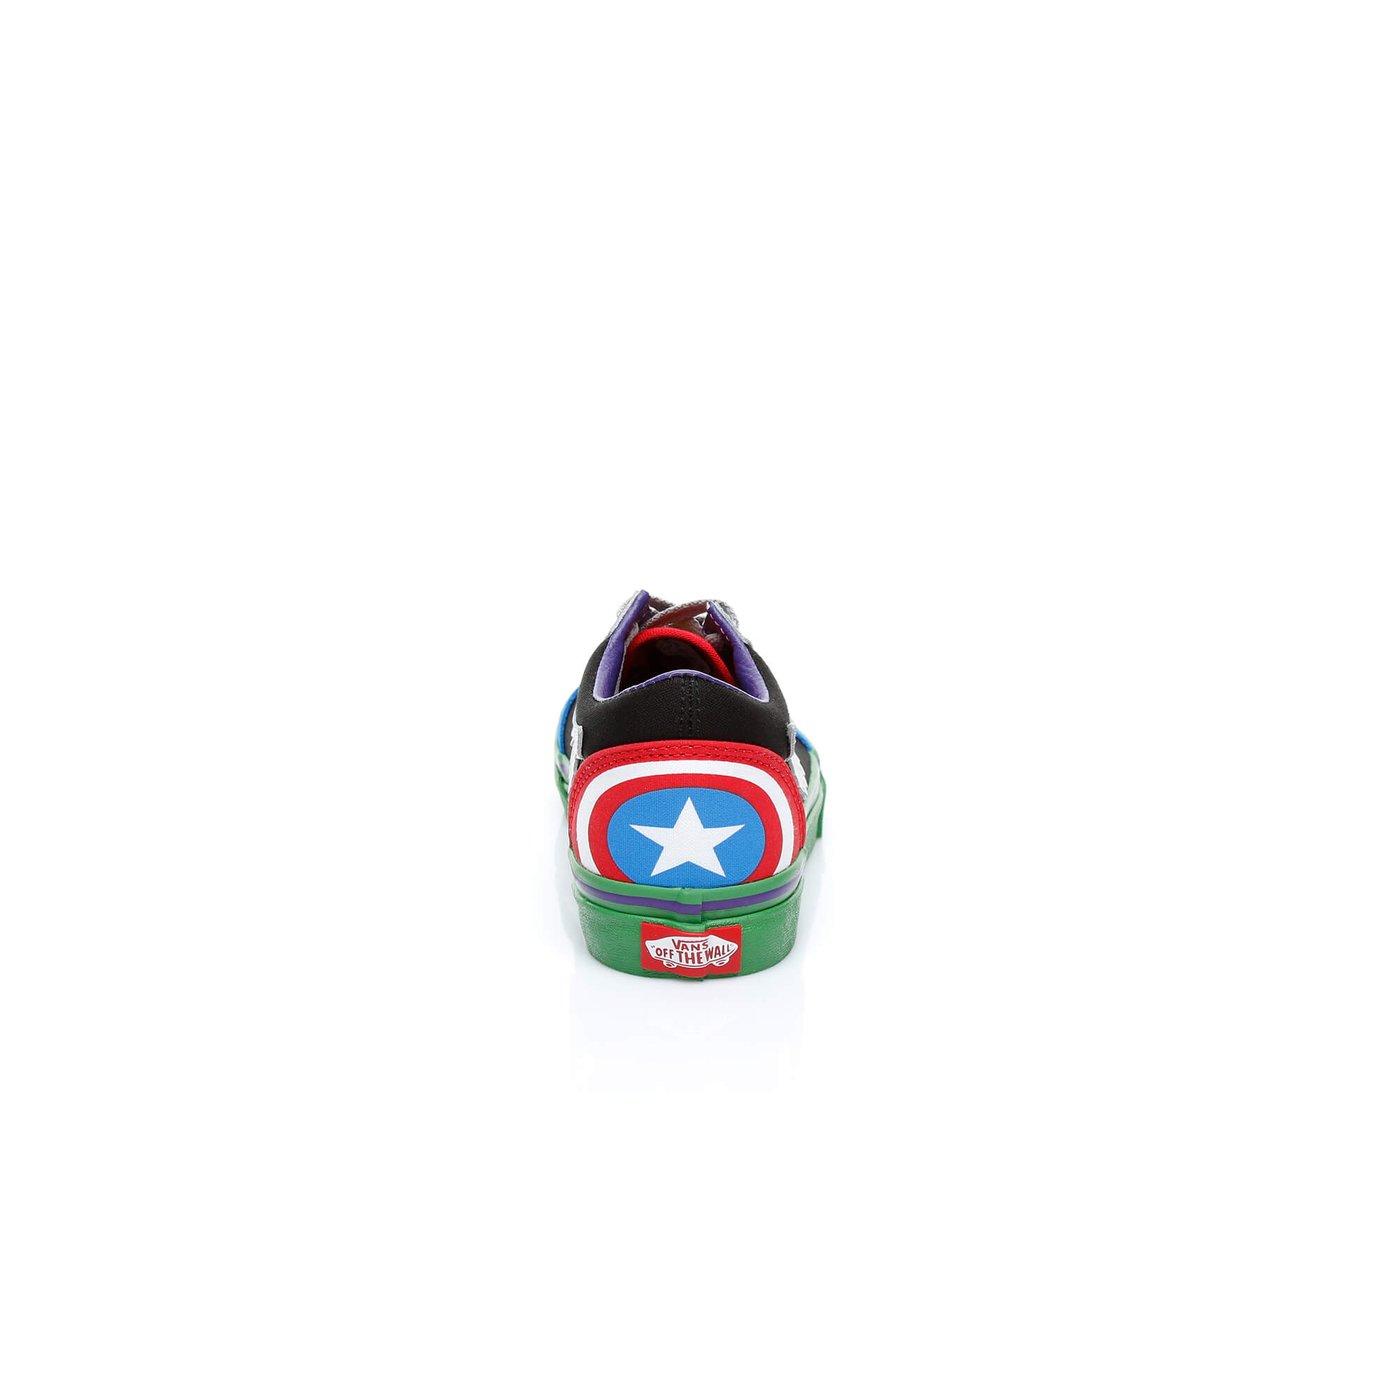 Vans x Marvel Avengers Old Skool Çocuk Renkli Sneaker